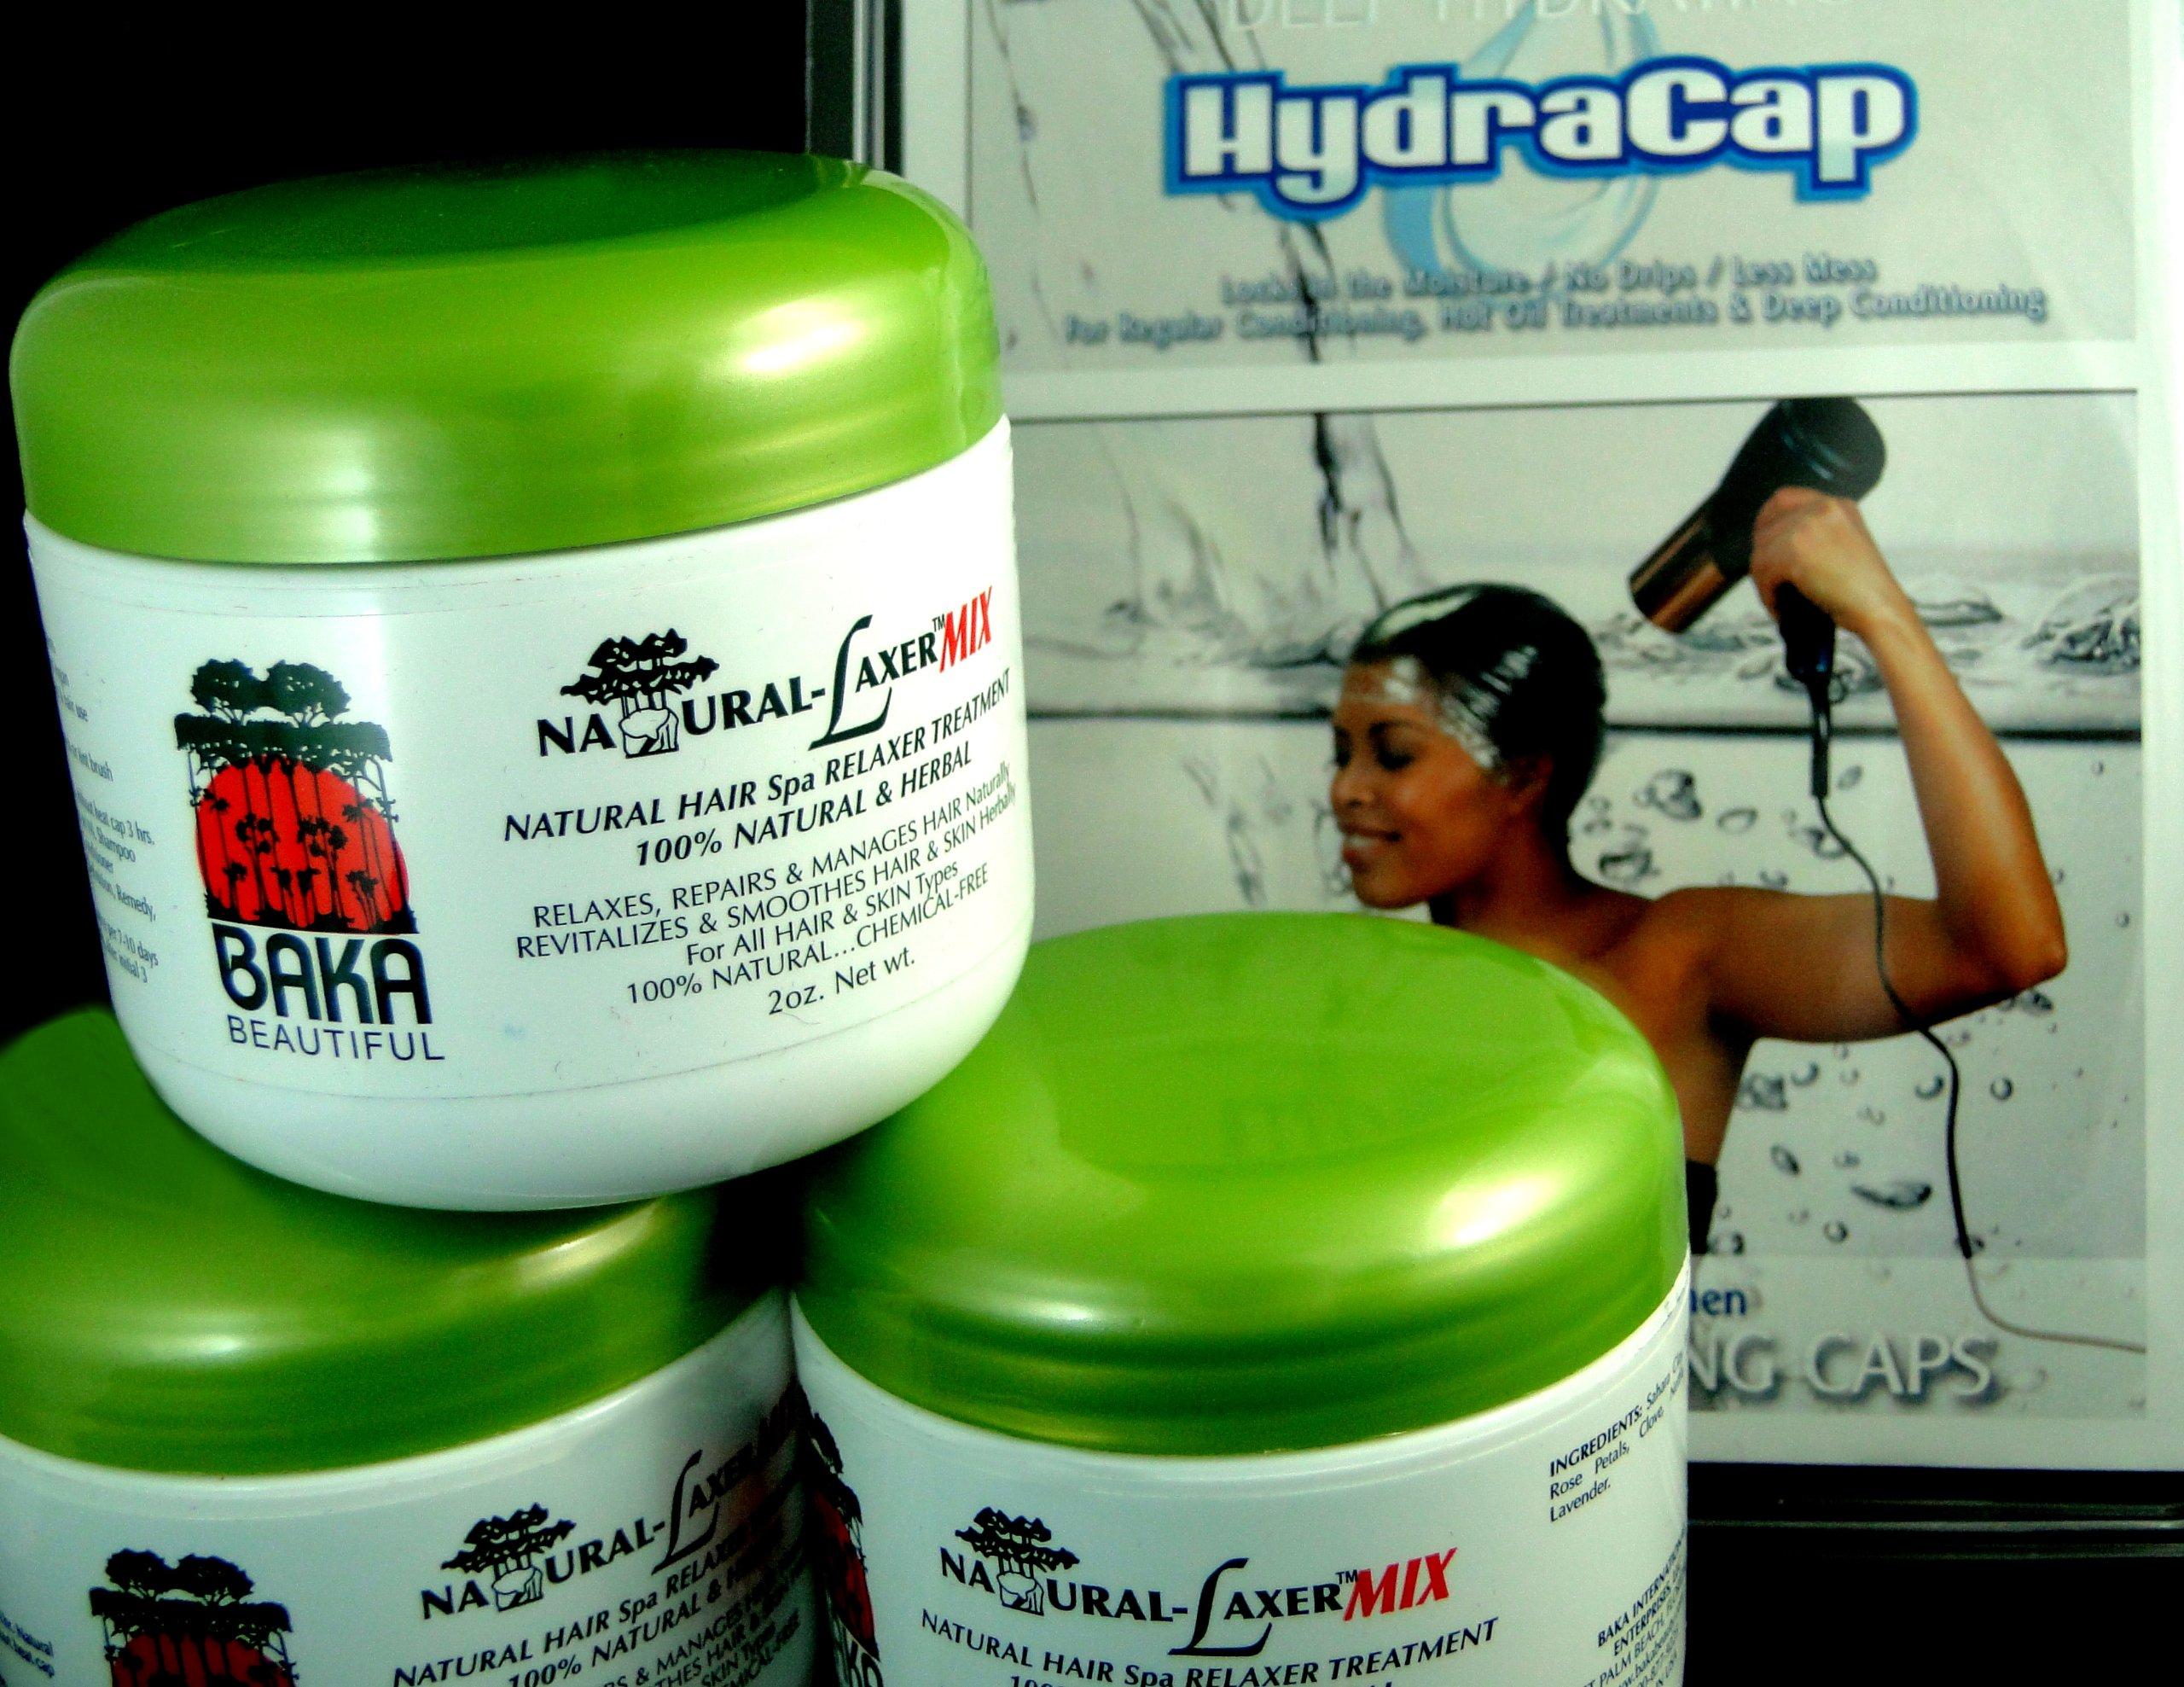 Hydra-Cap 3 pack Plus Natural-Laxer Trio